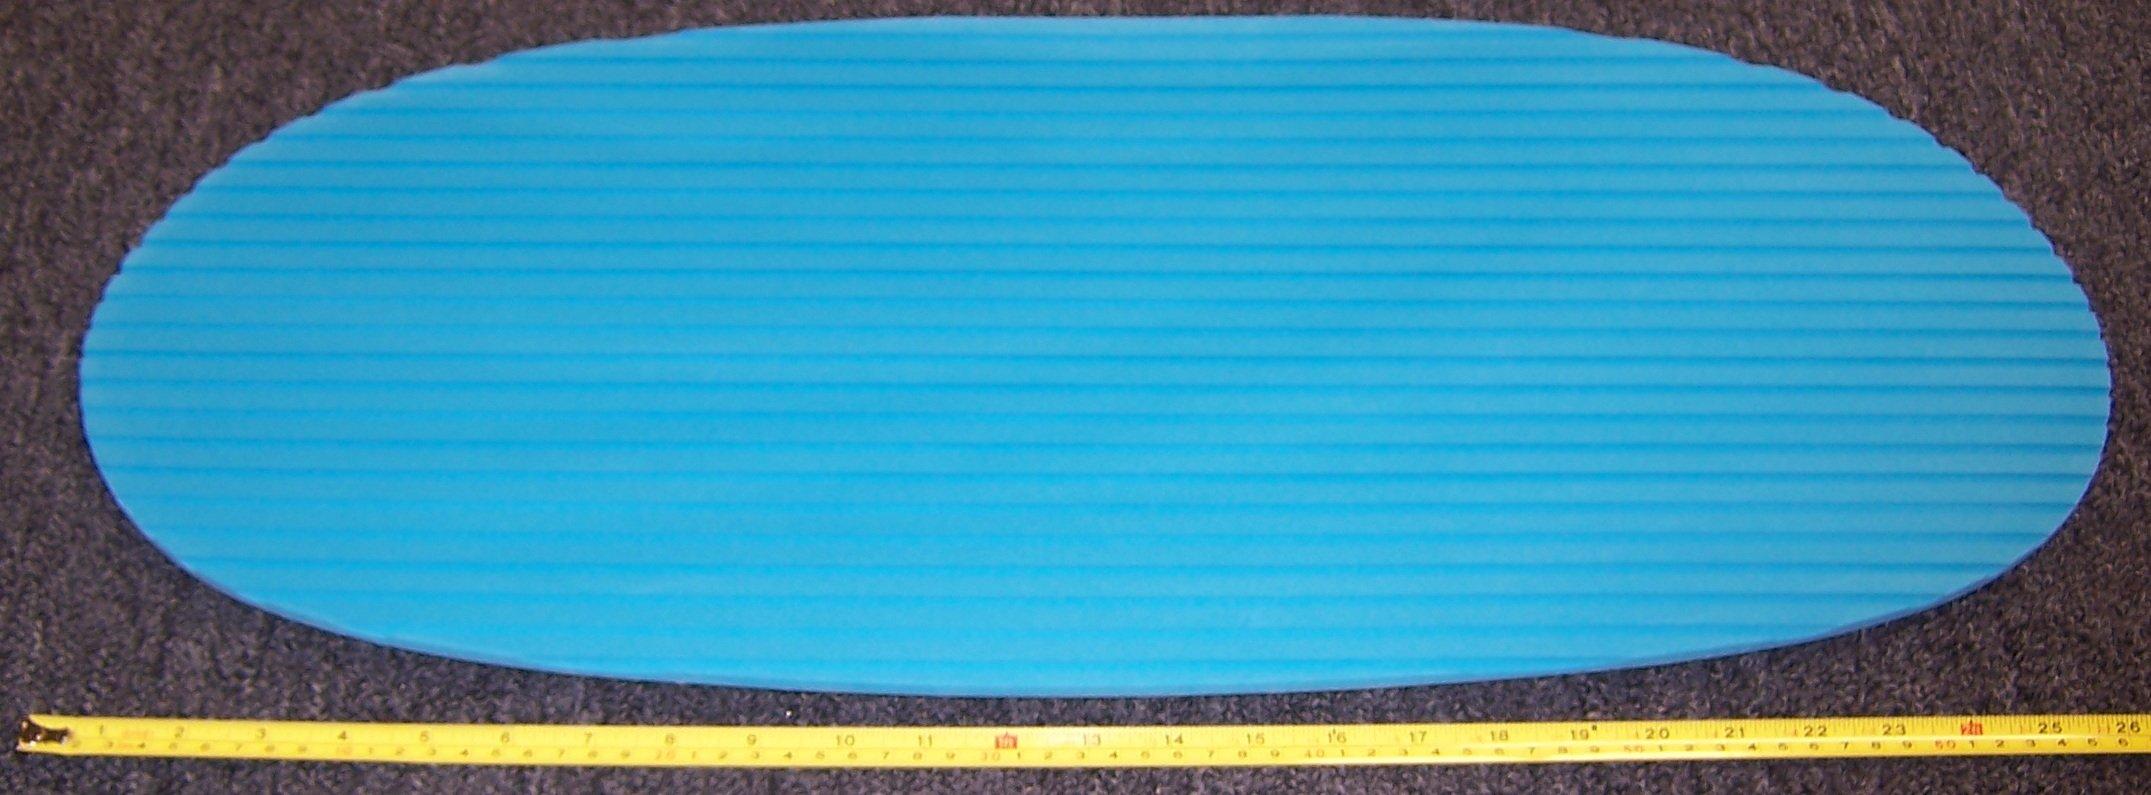 Hobie - Seat Pad Lt Blue - 38010061